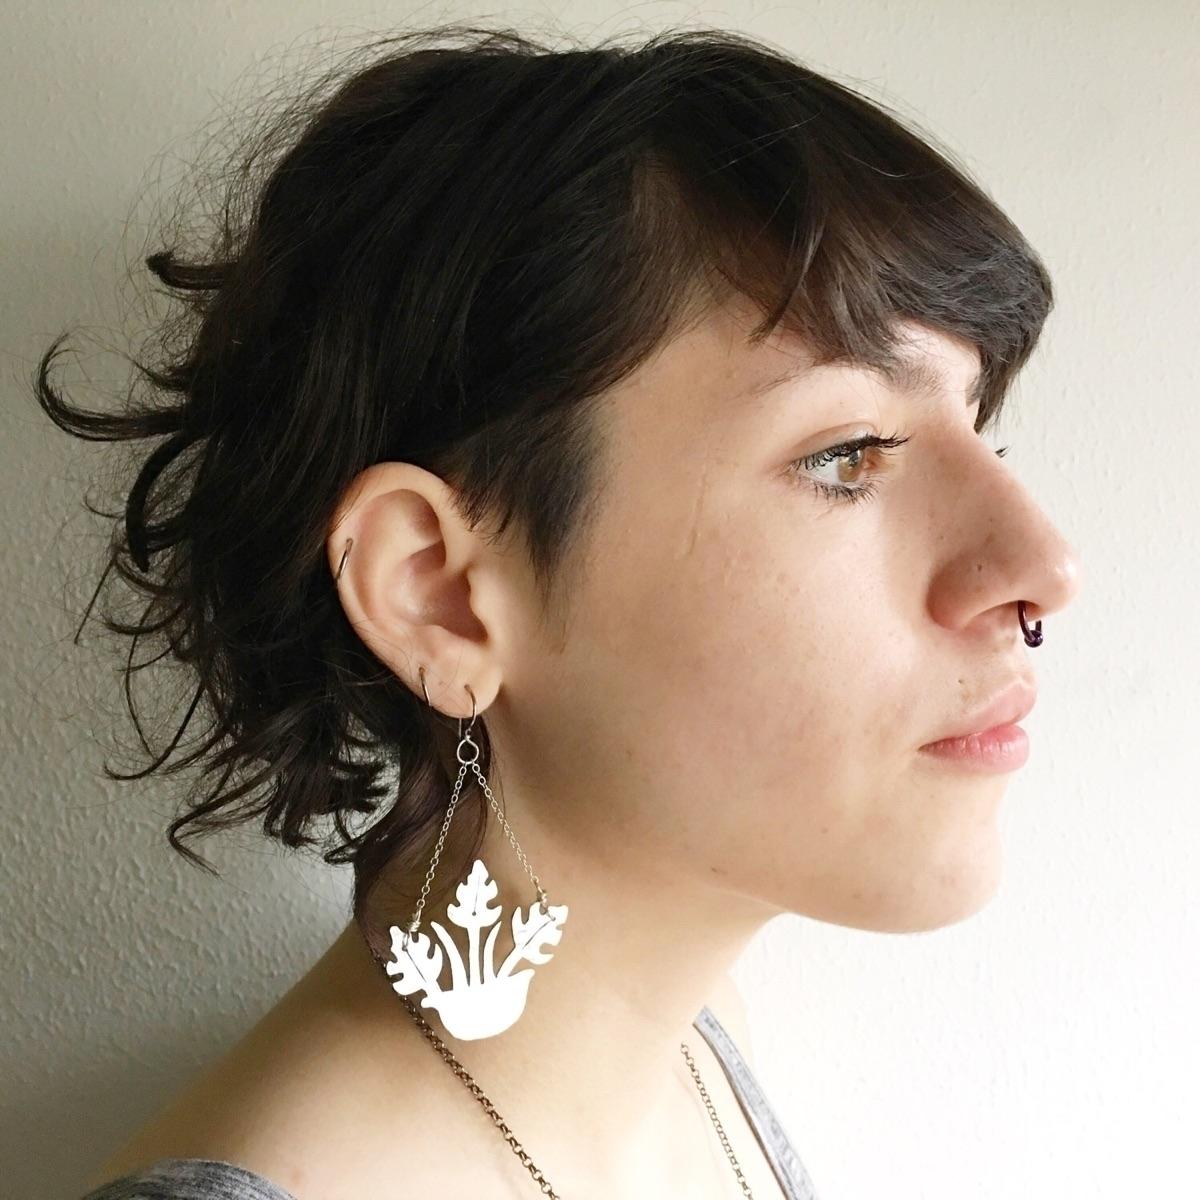 close making sweet swinging mon - asotojewelry | ello